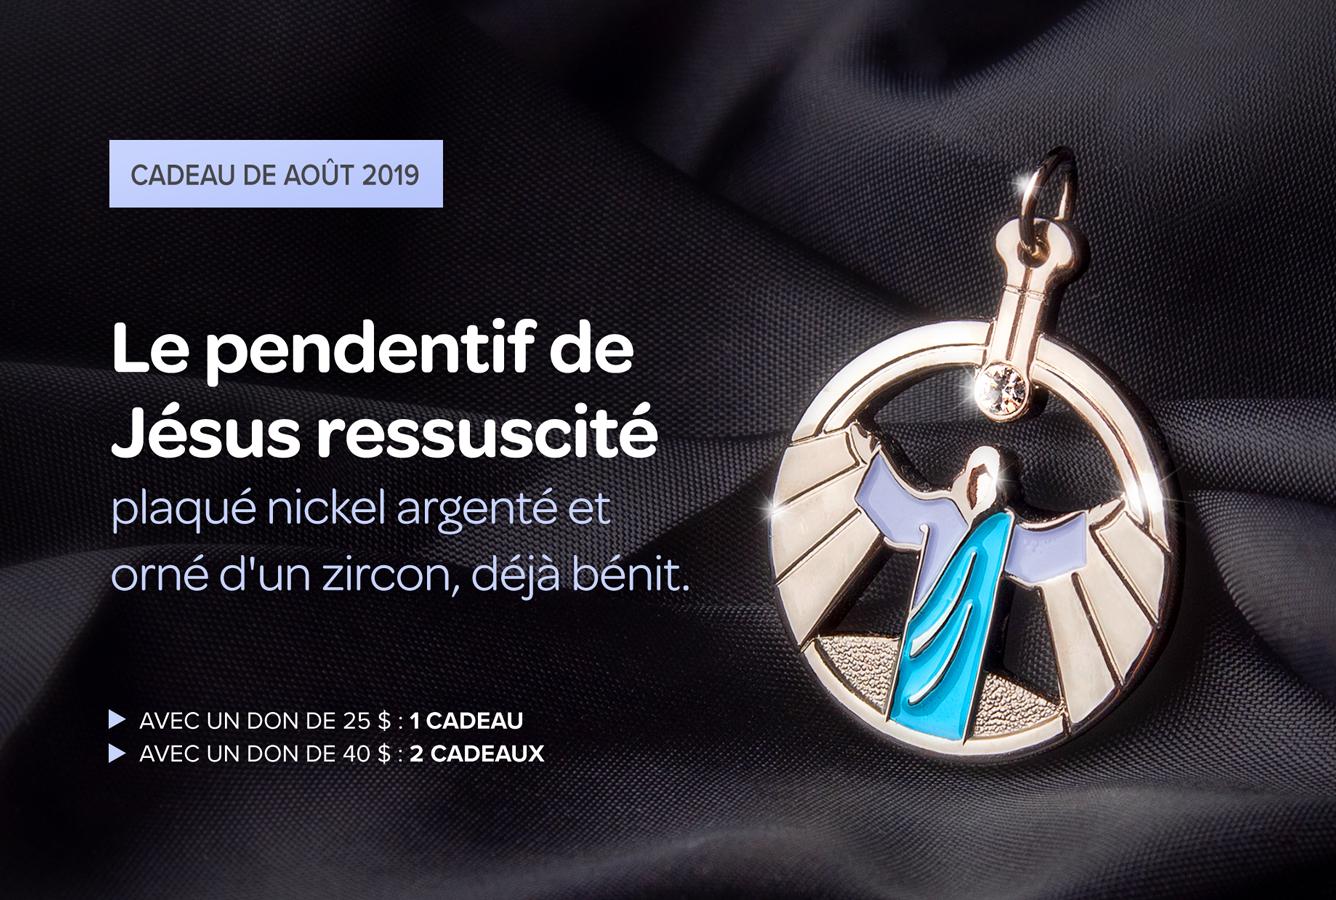 Cadeau d'août 2019